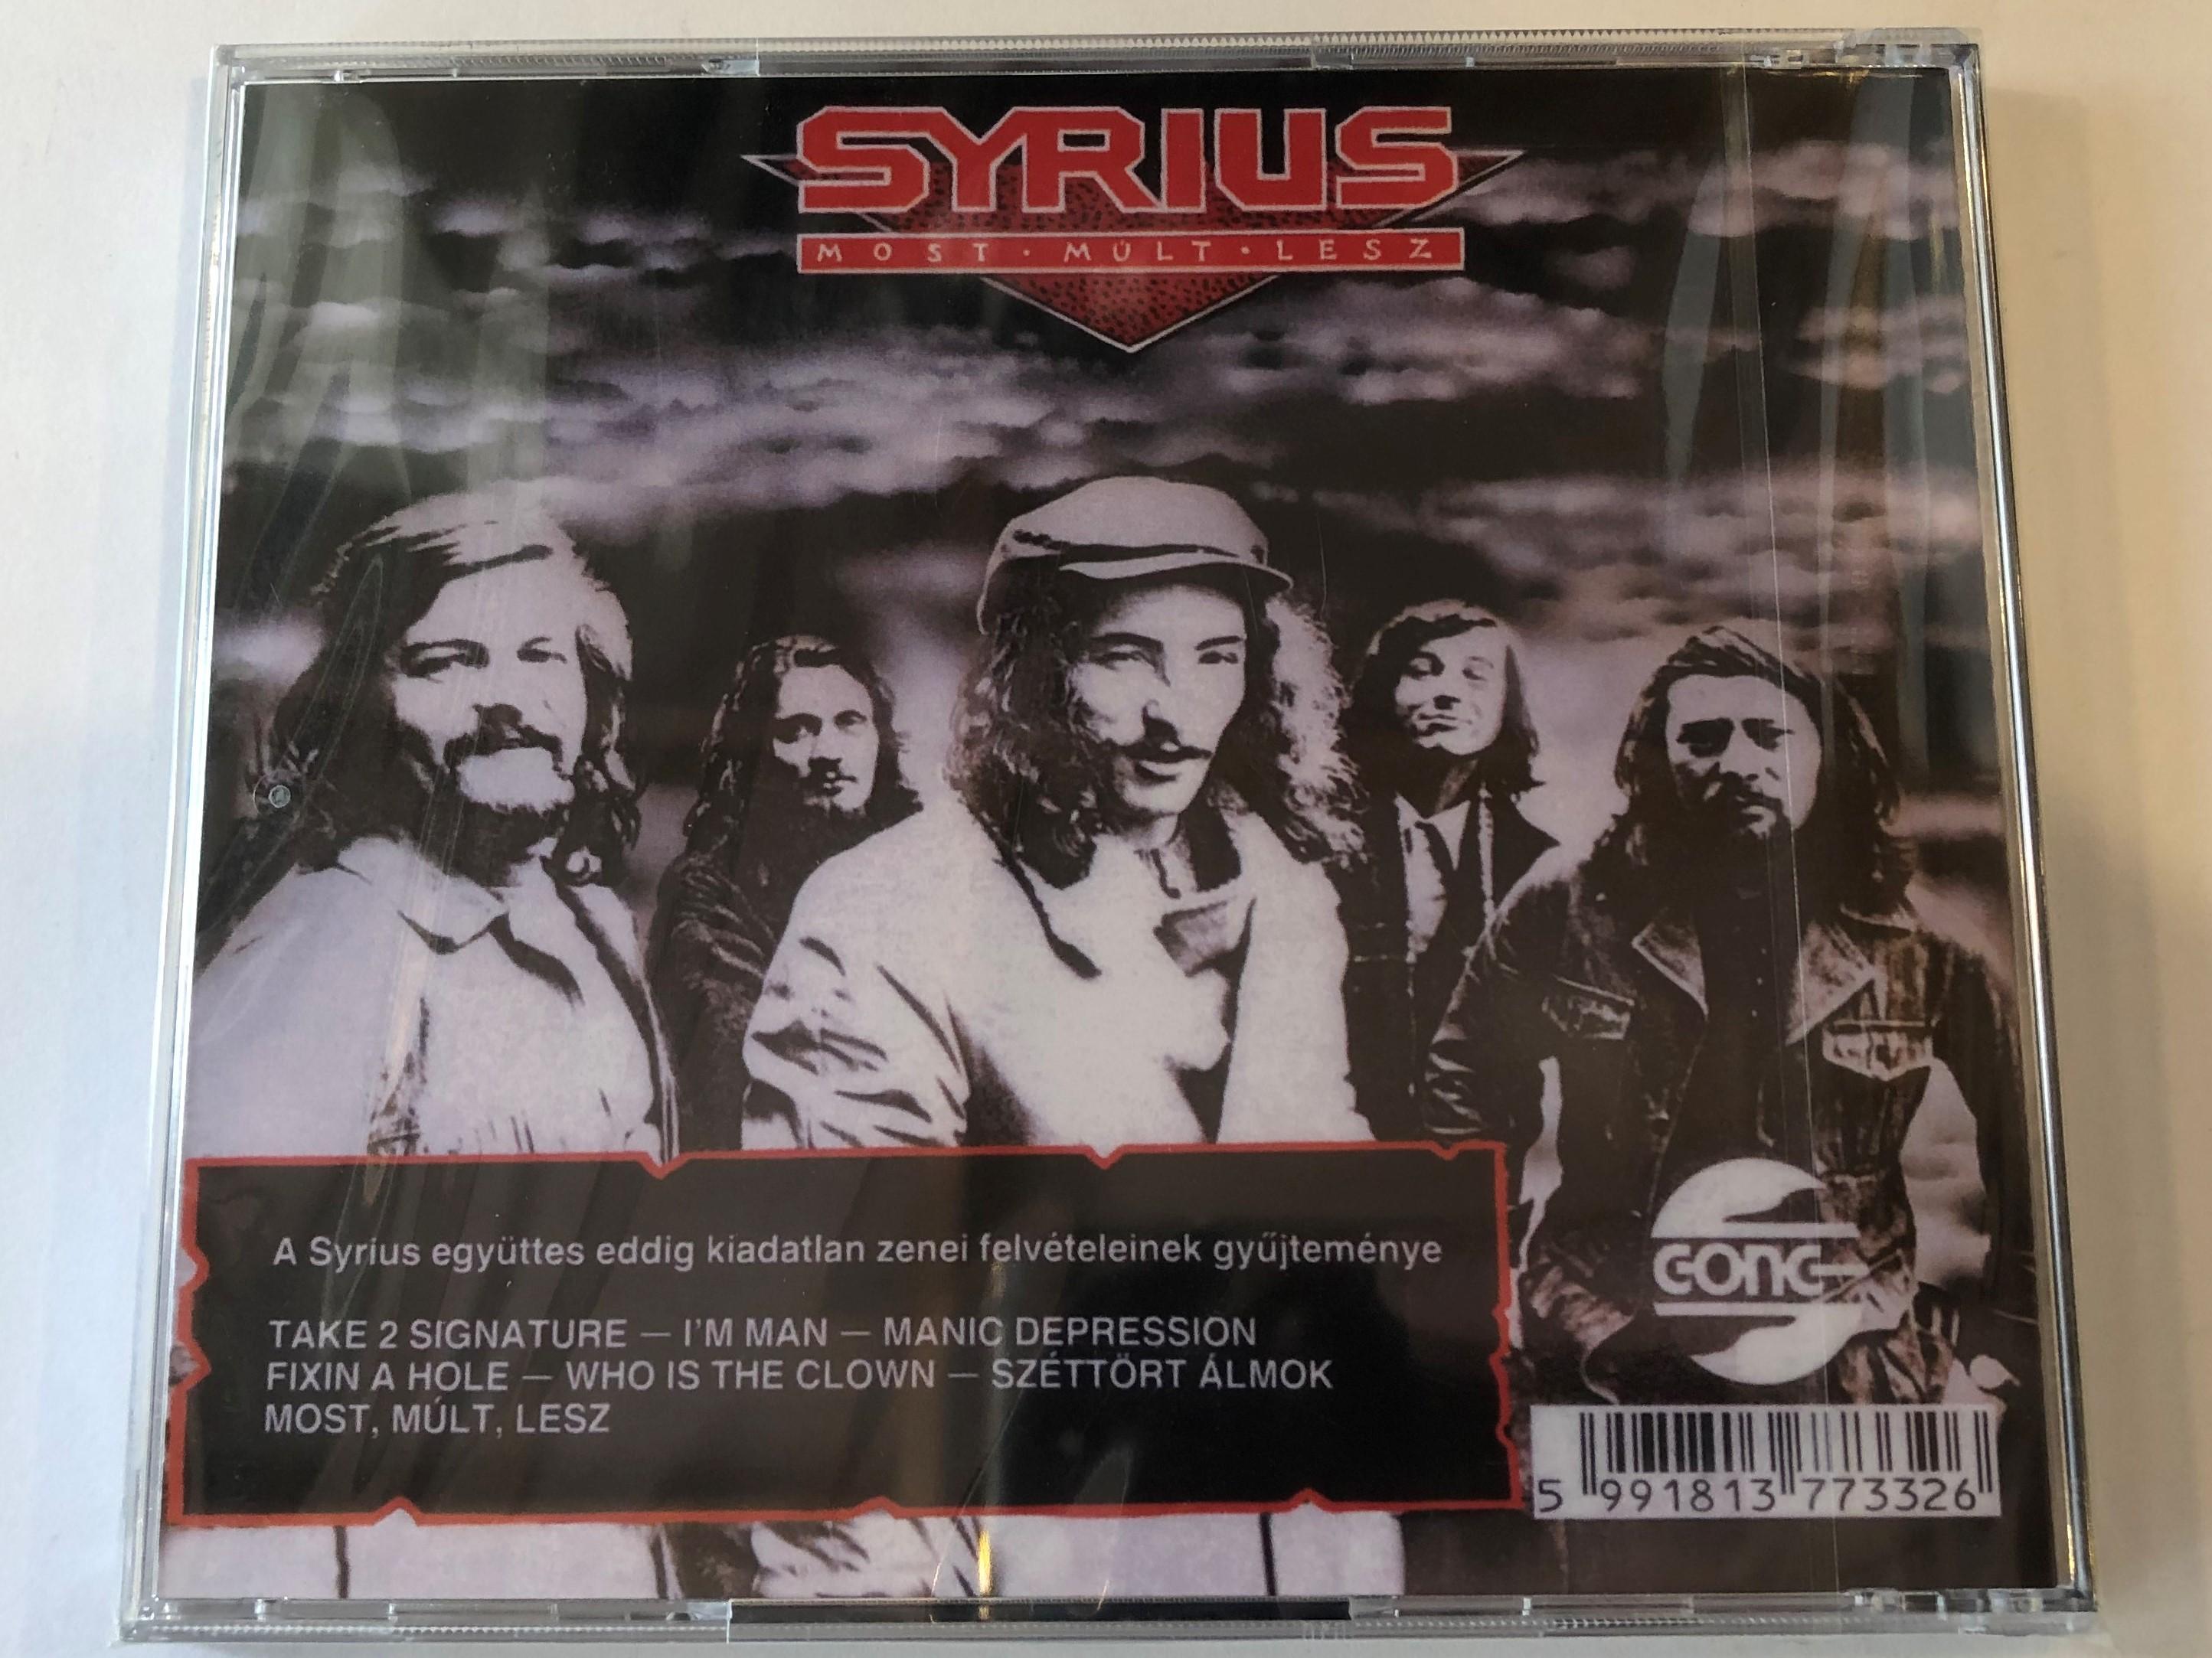 syrius-most-m-lt-lesz-gong-audio-cd-hcd-37733-2-.jpg